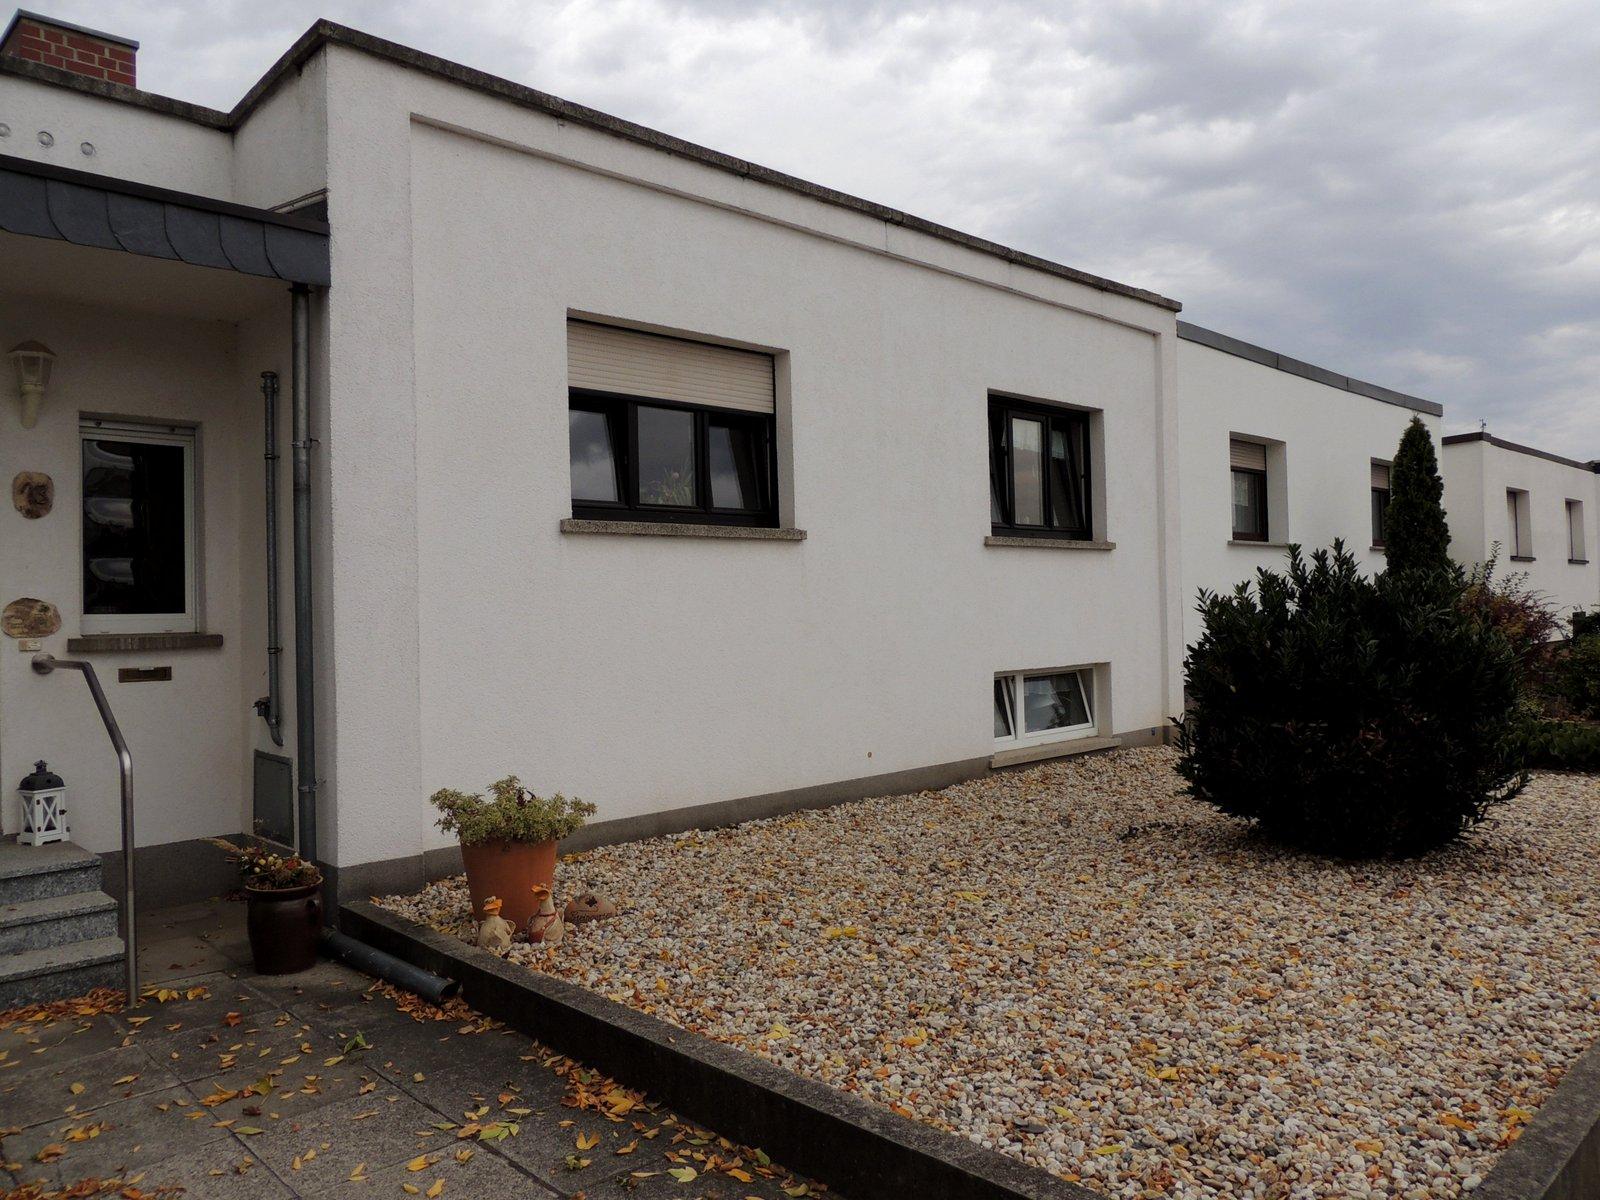 Bauhaus Siedlung Törten Dessau